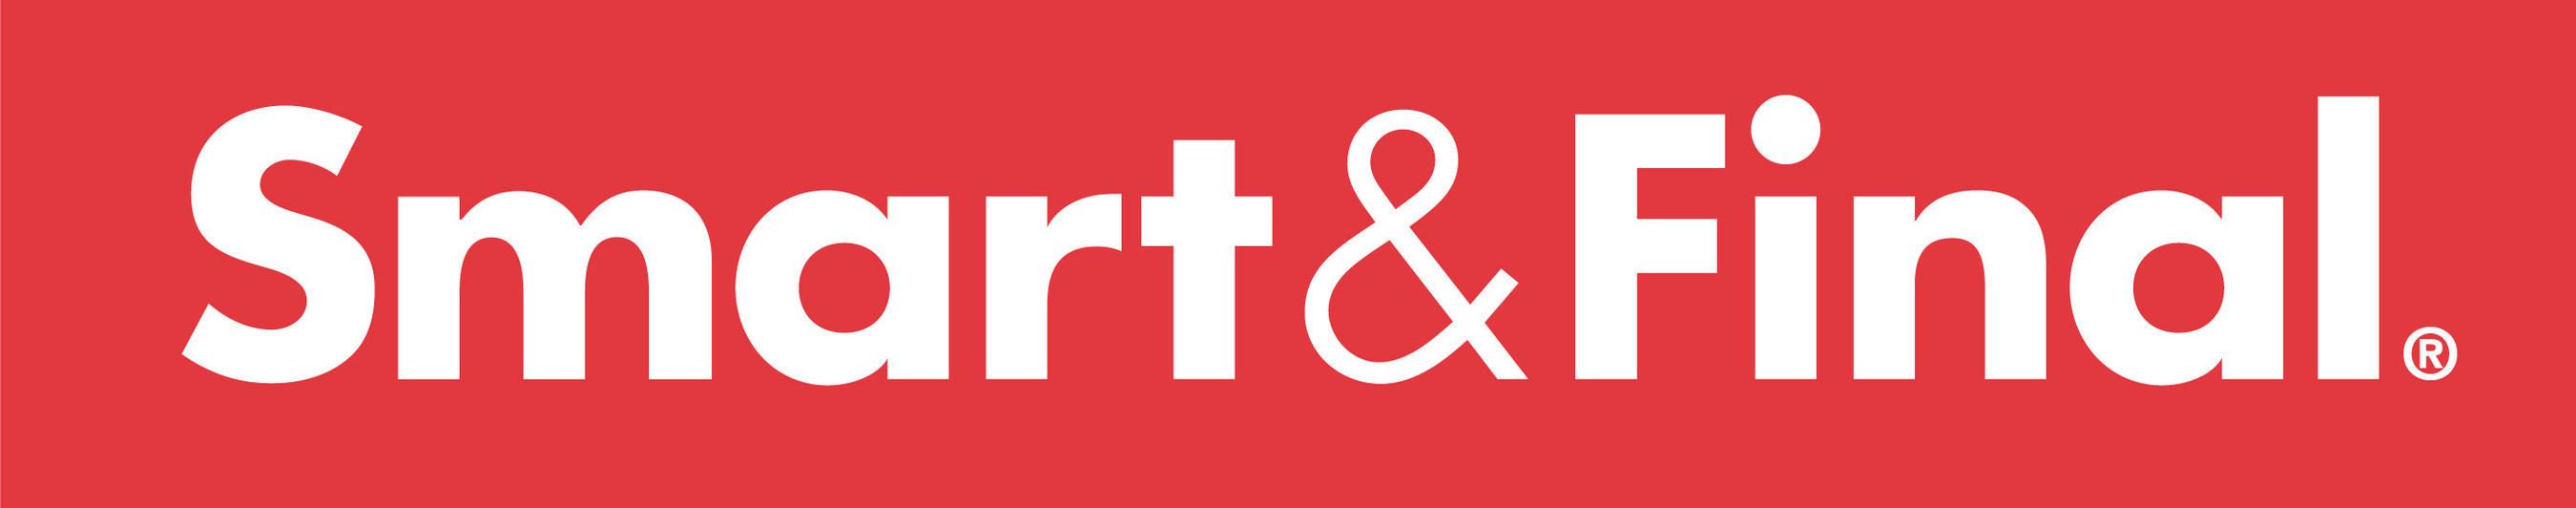 Smart & Final Stores, Inc. logo